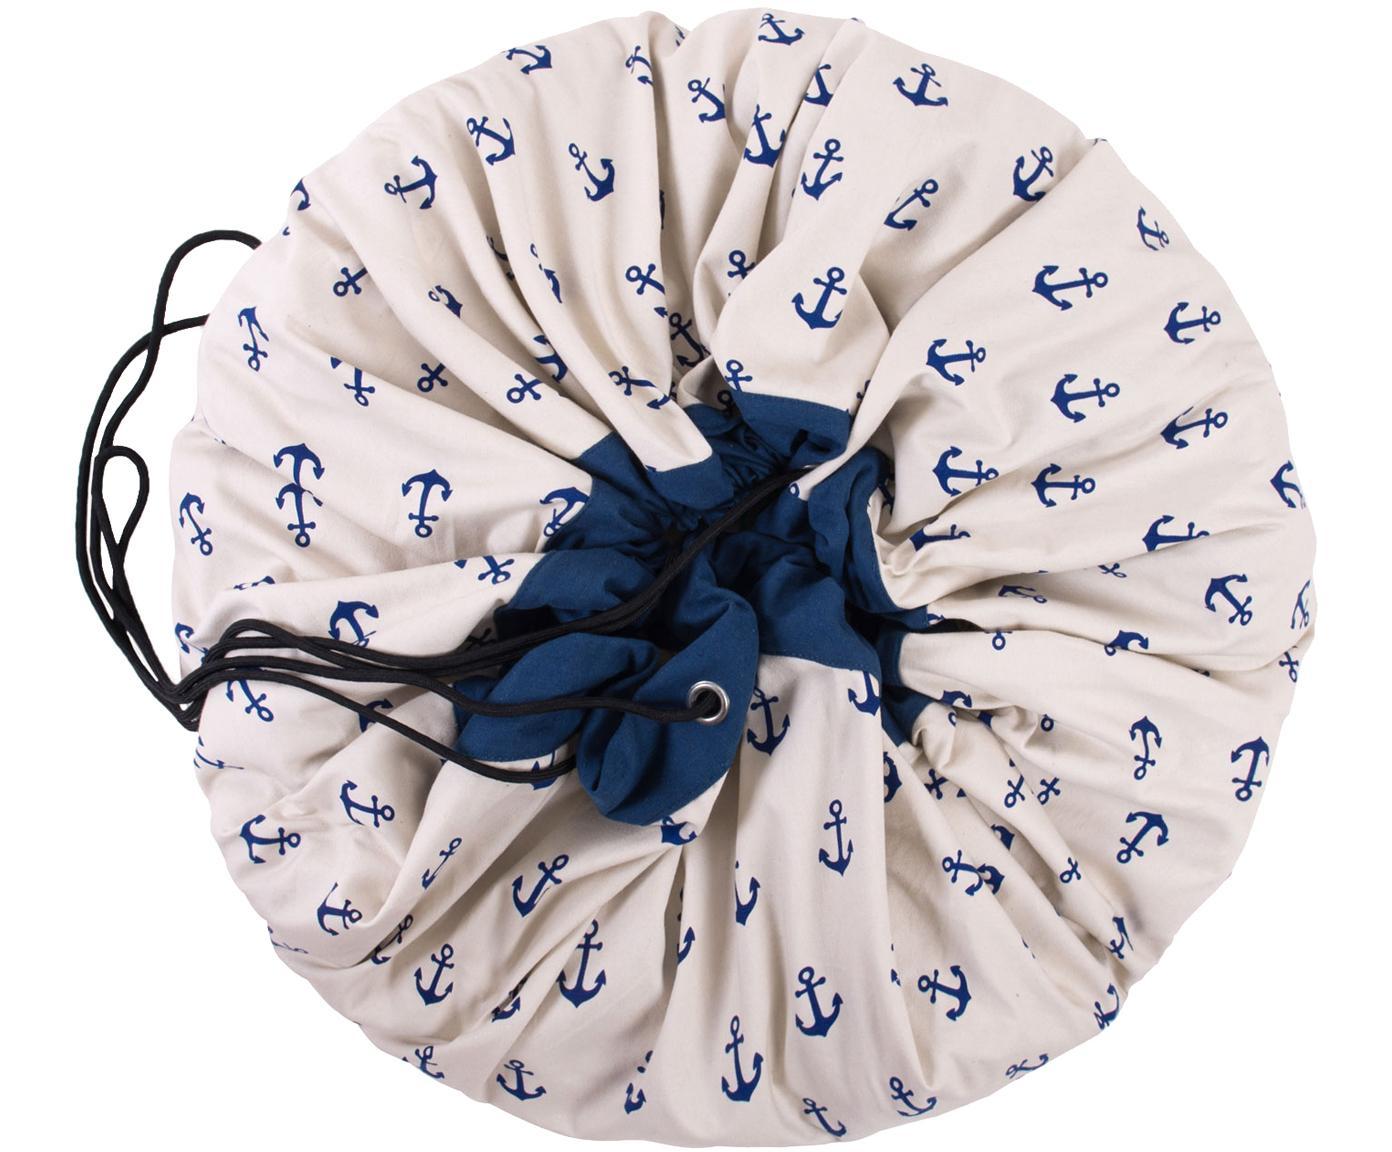 Manta de juegos Anchors, Poliéster, Blanco, azul, Ø 140 cm